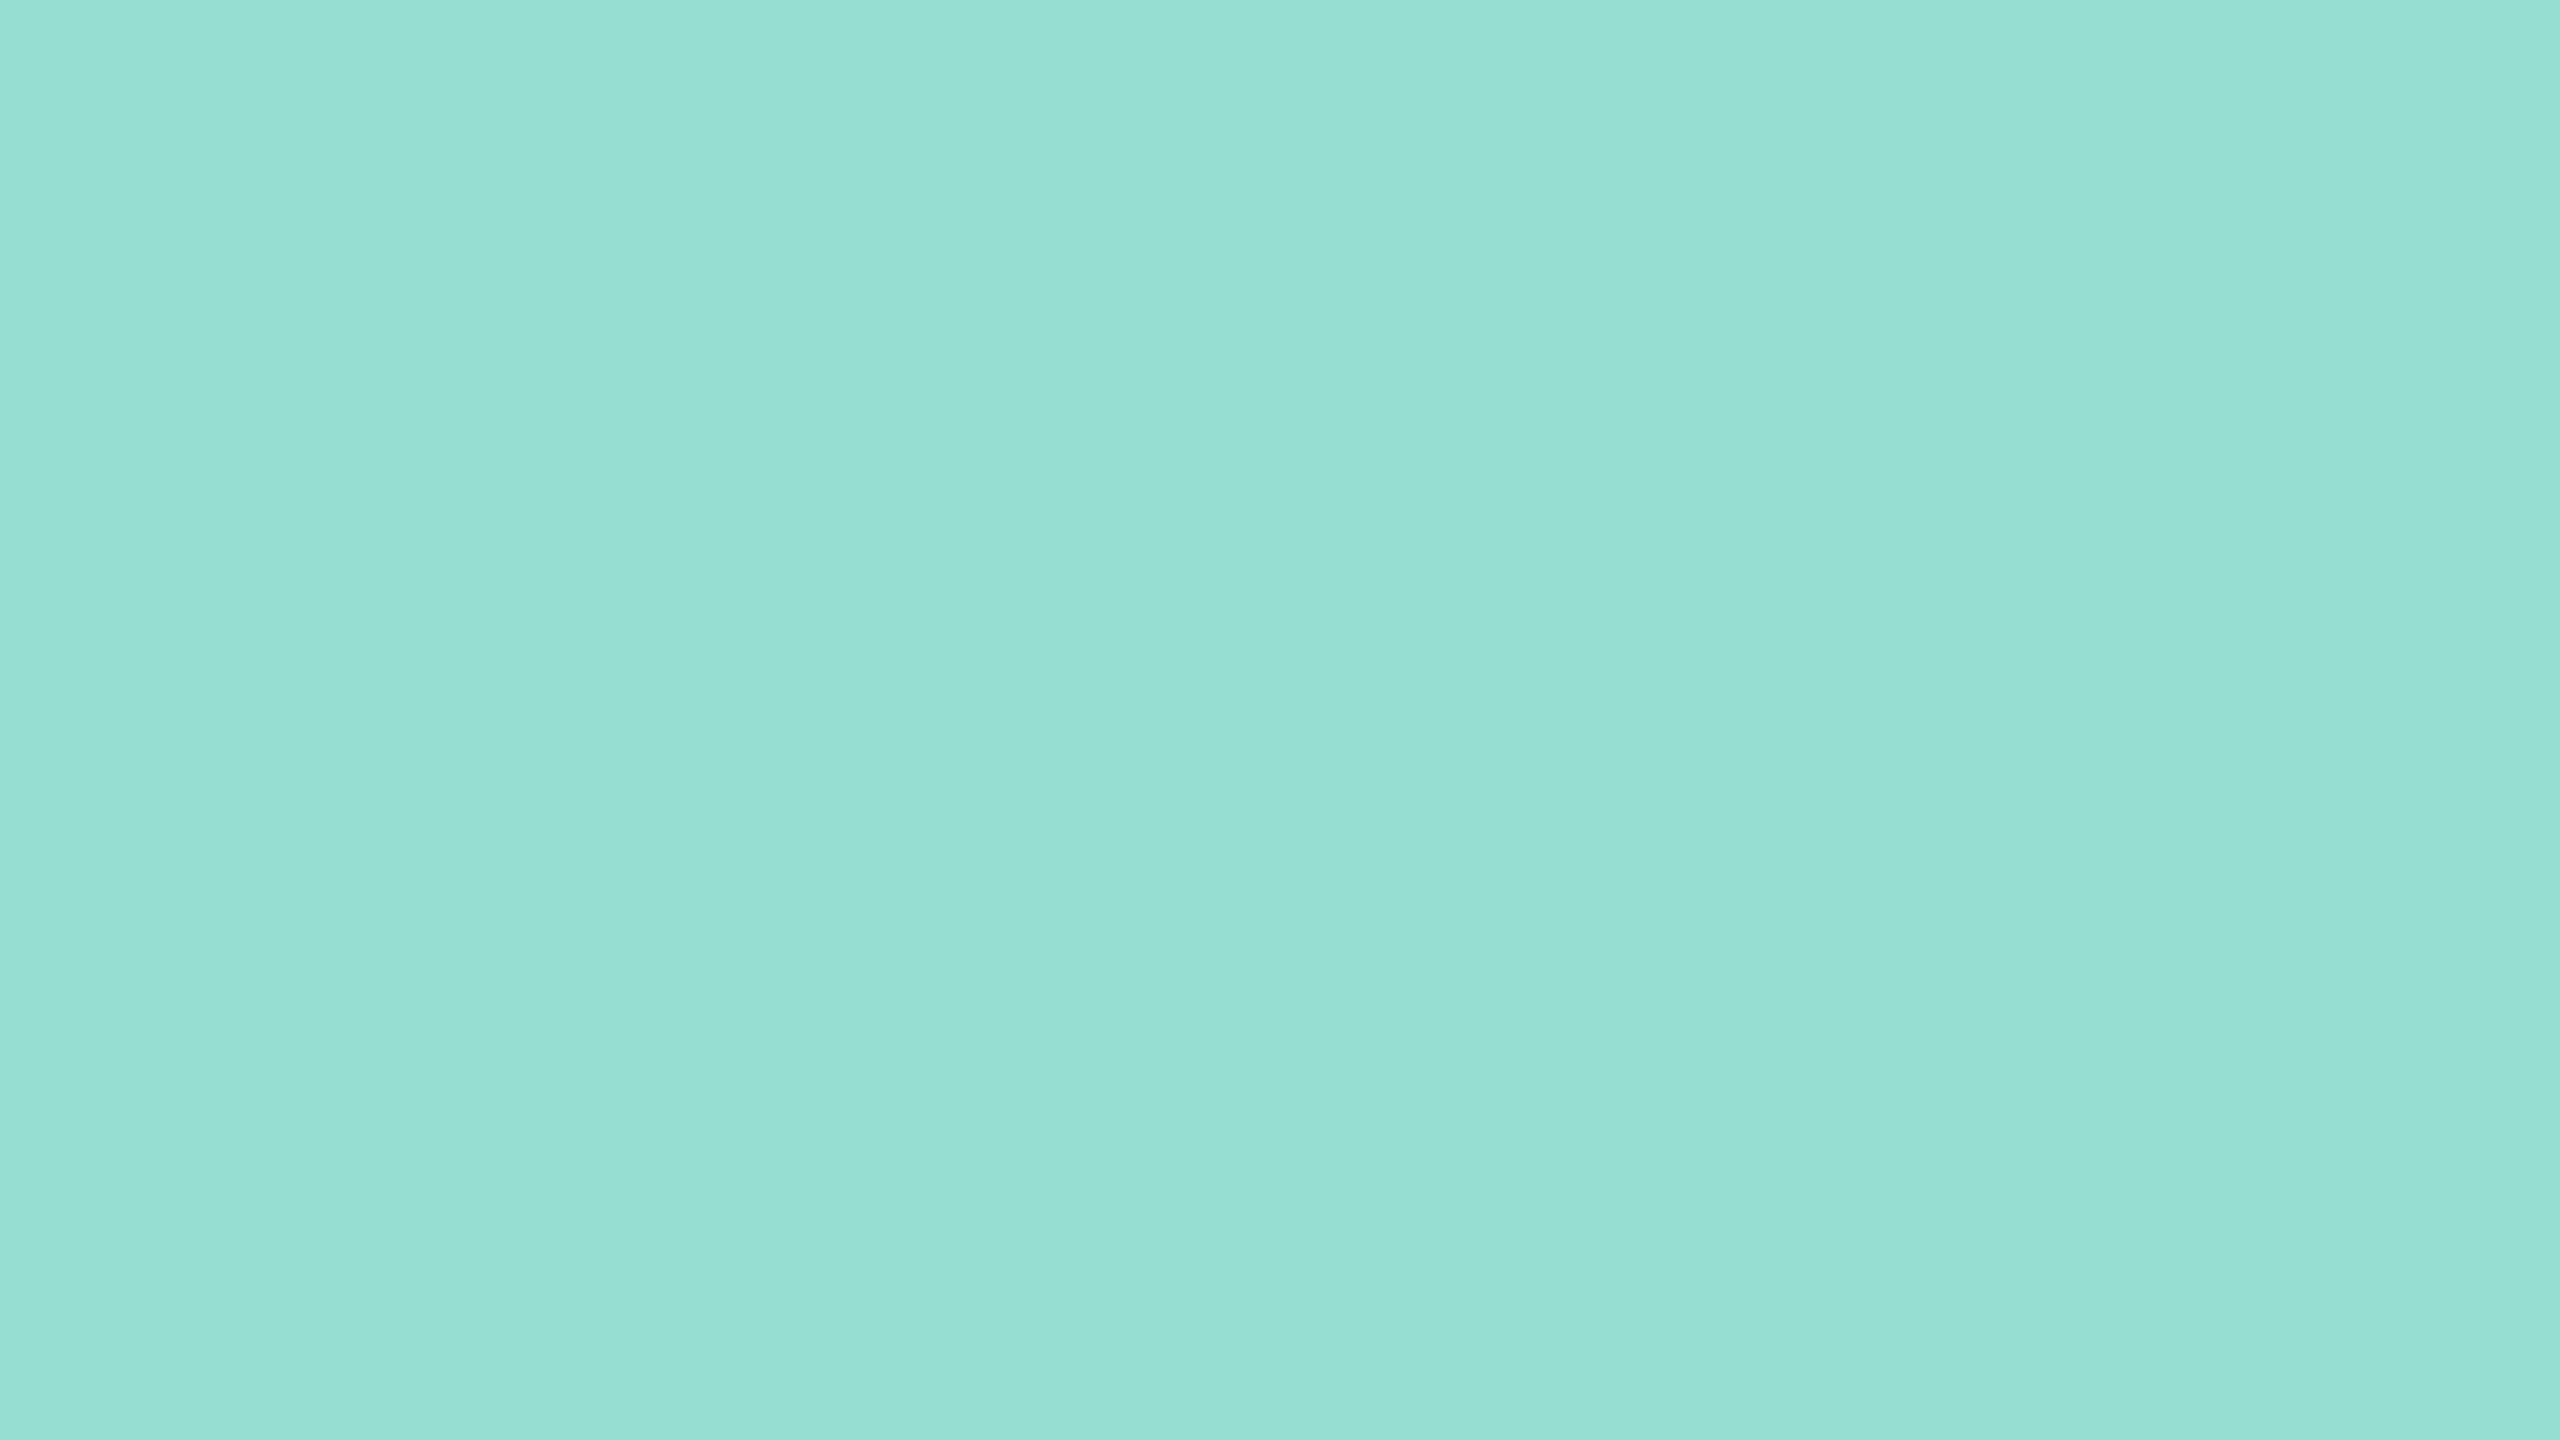 2560x1440 Pale Robin Egg Blue Solid Color Background